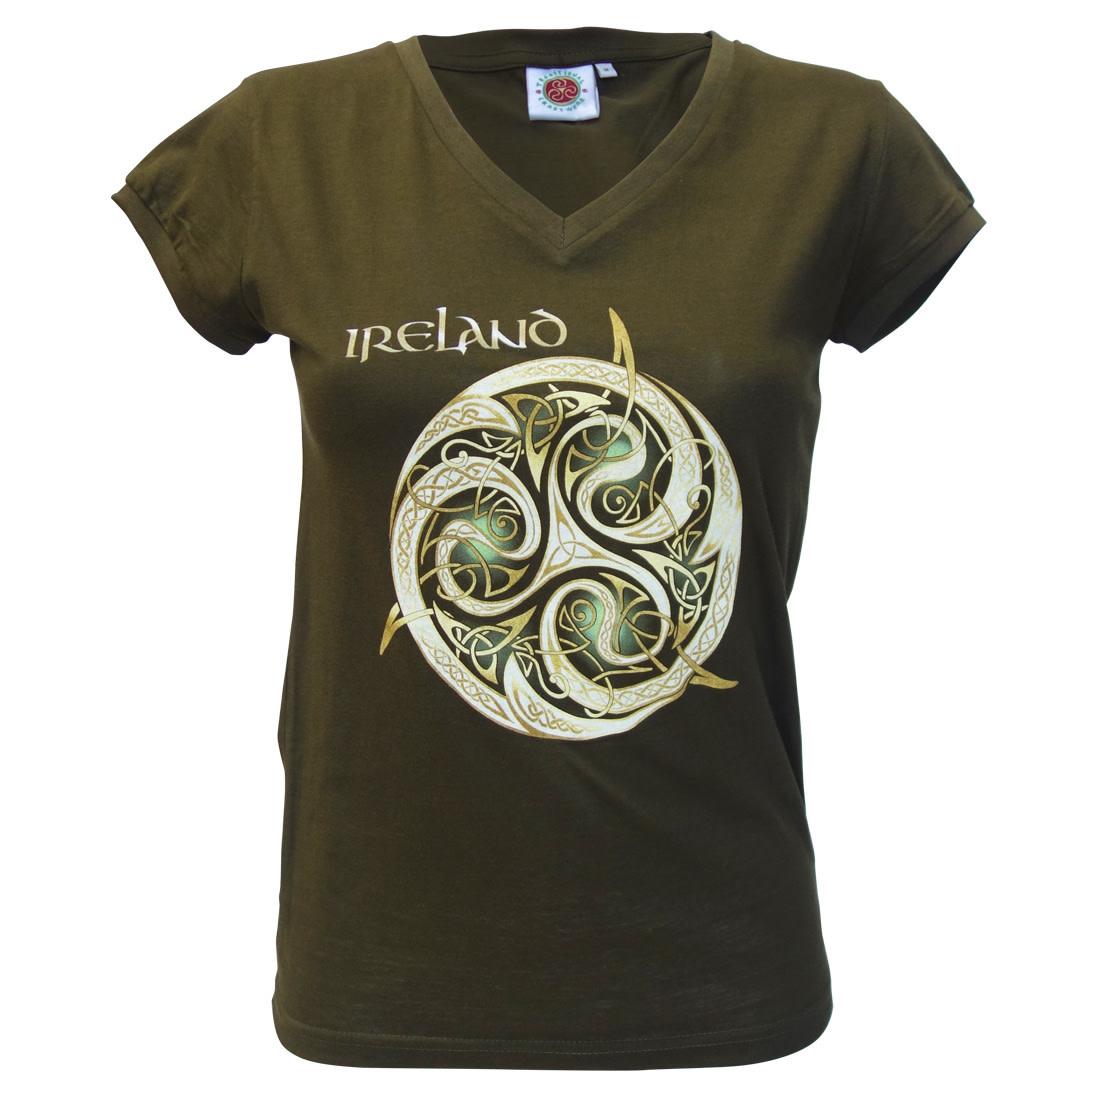 T-shirt-Ladies Ireland V Neck